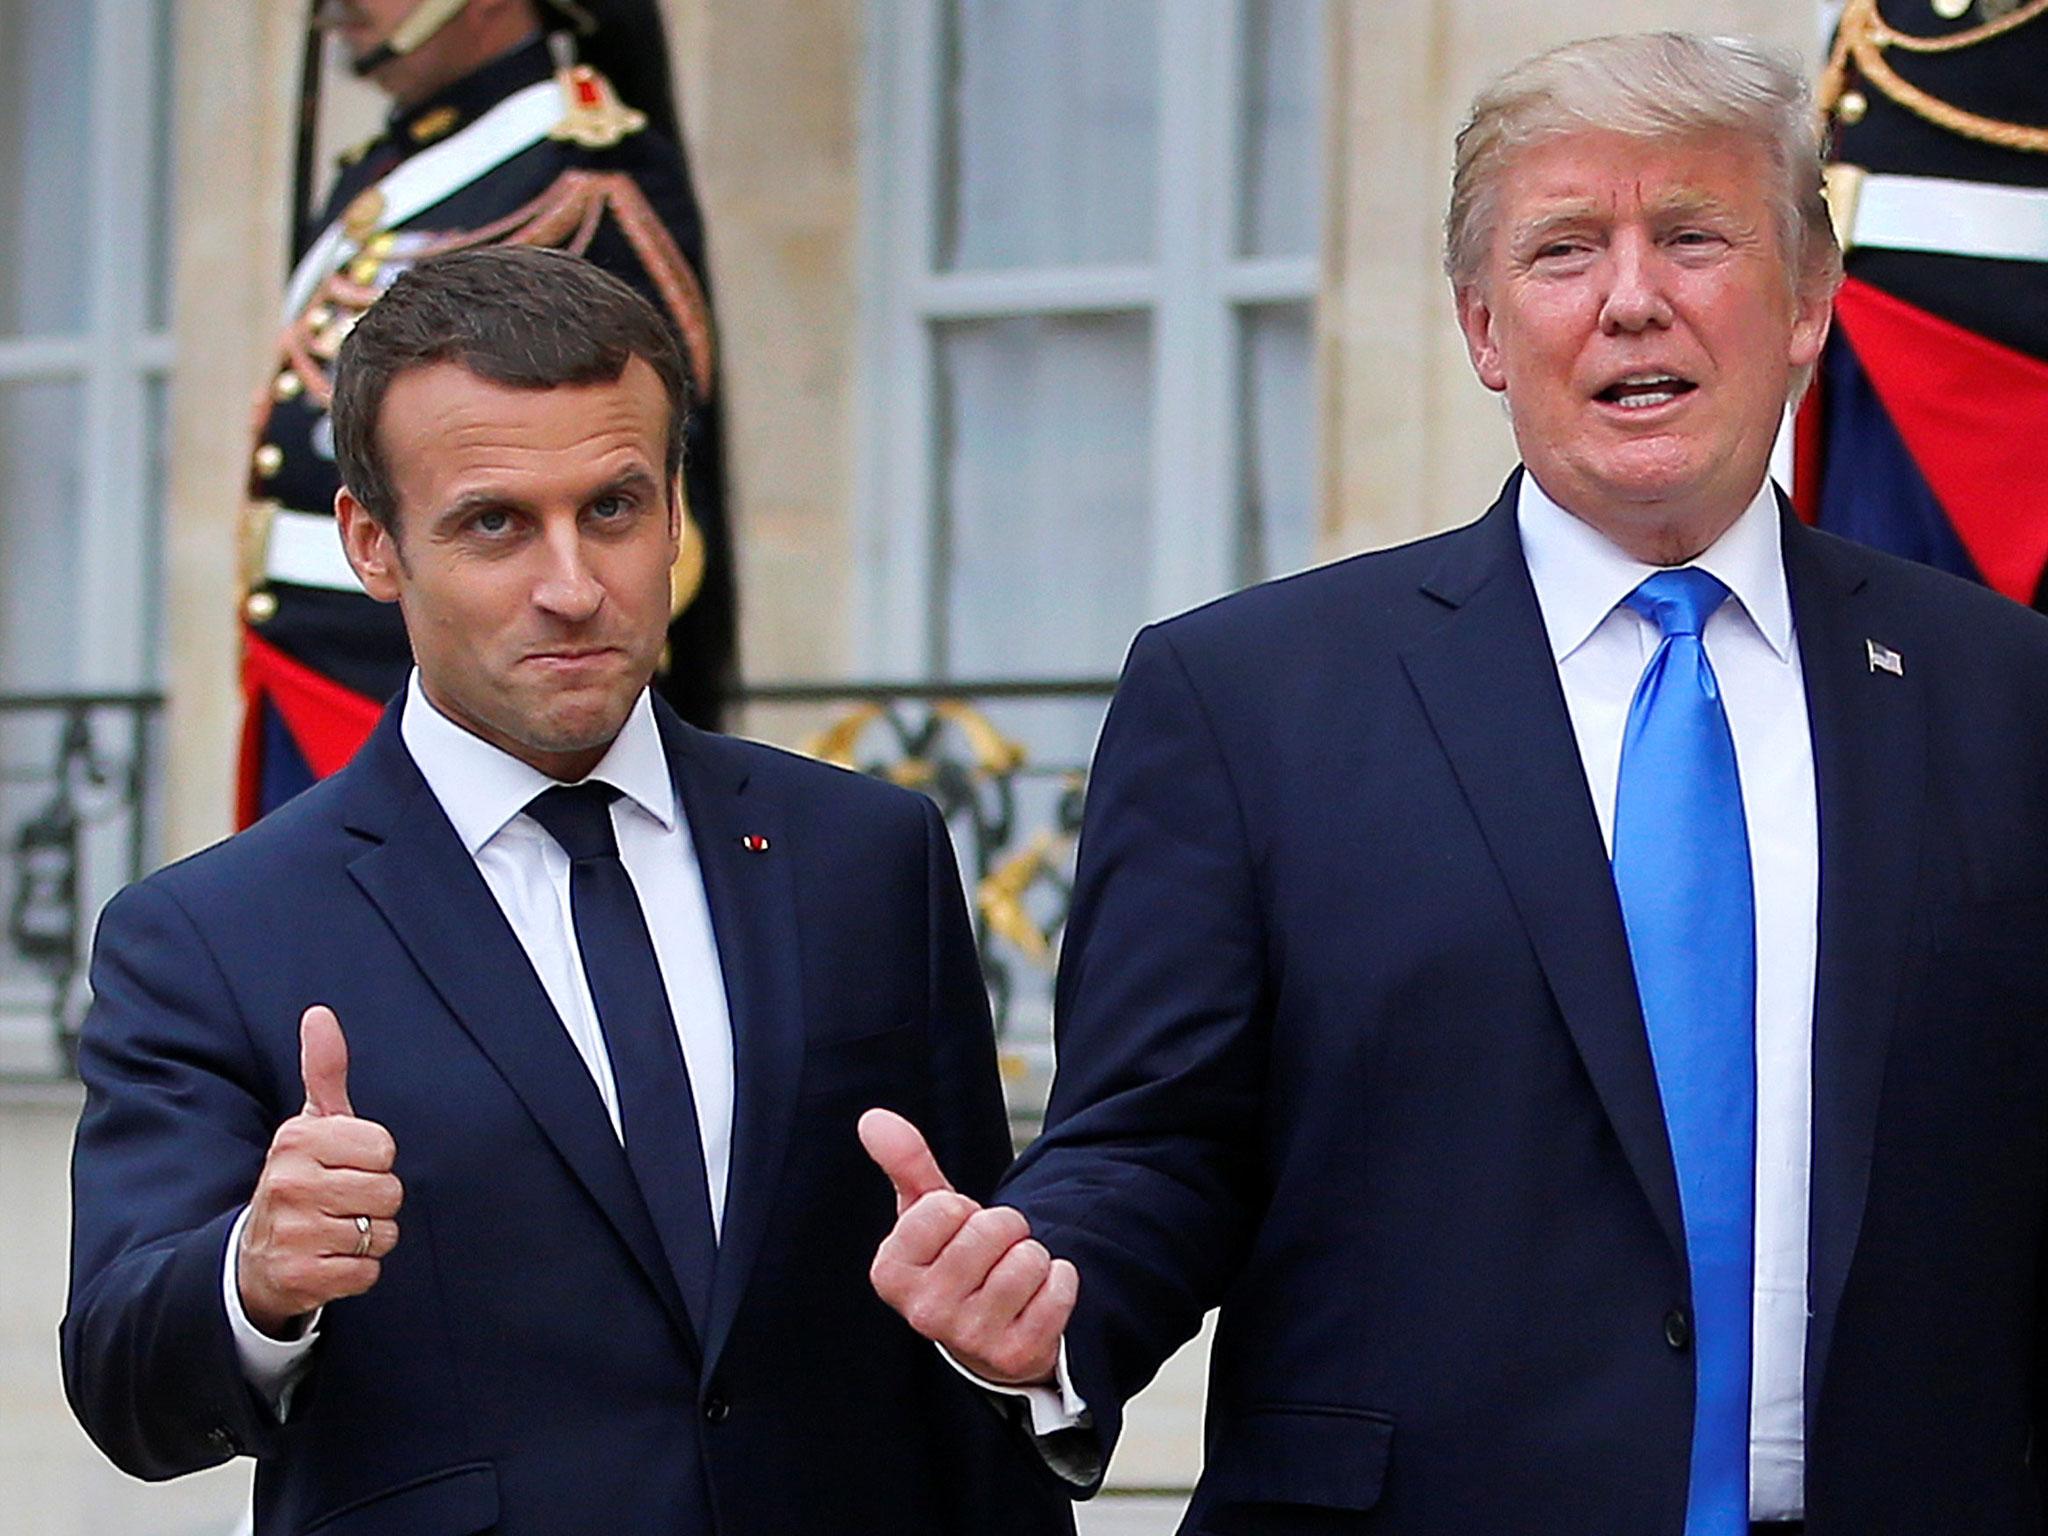 Donald Trump Emmanuel Macron handshake state dinner